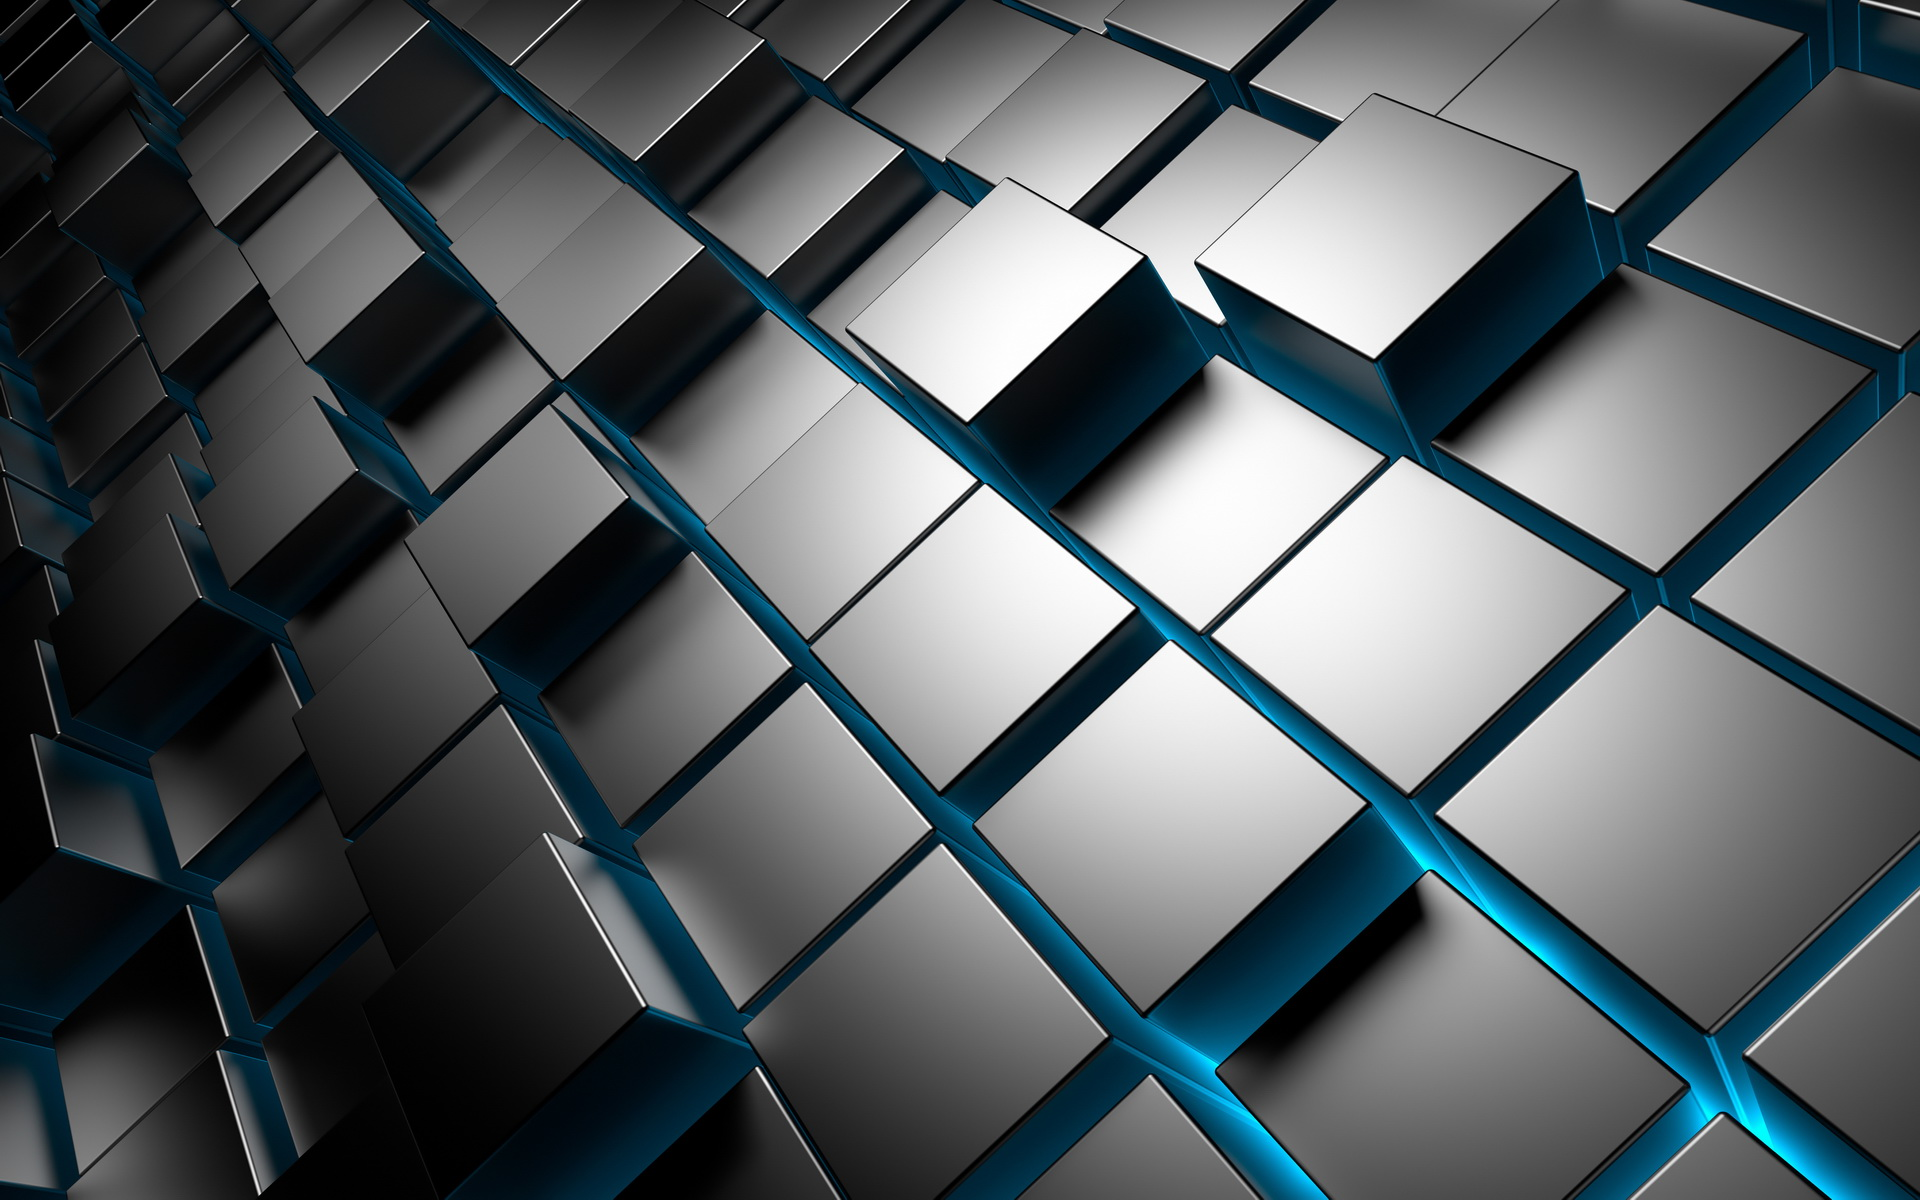 download Cube Computer Wallpapers Desktop Backgrounds 1920x1200